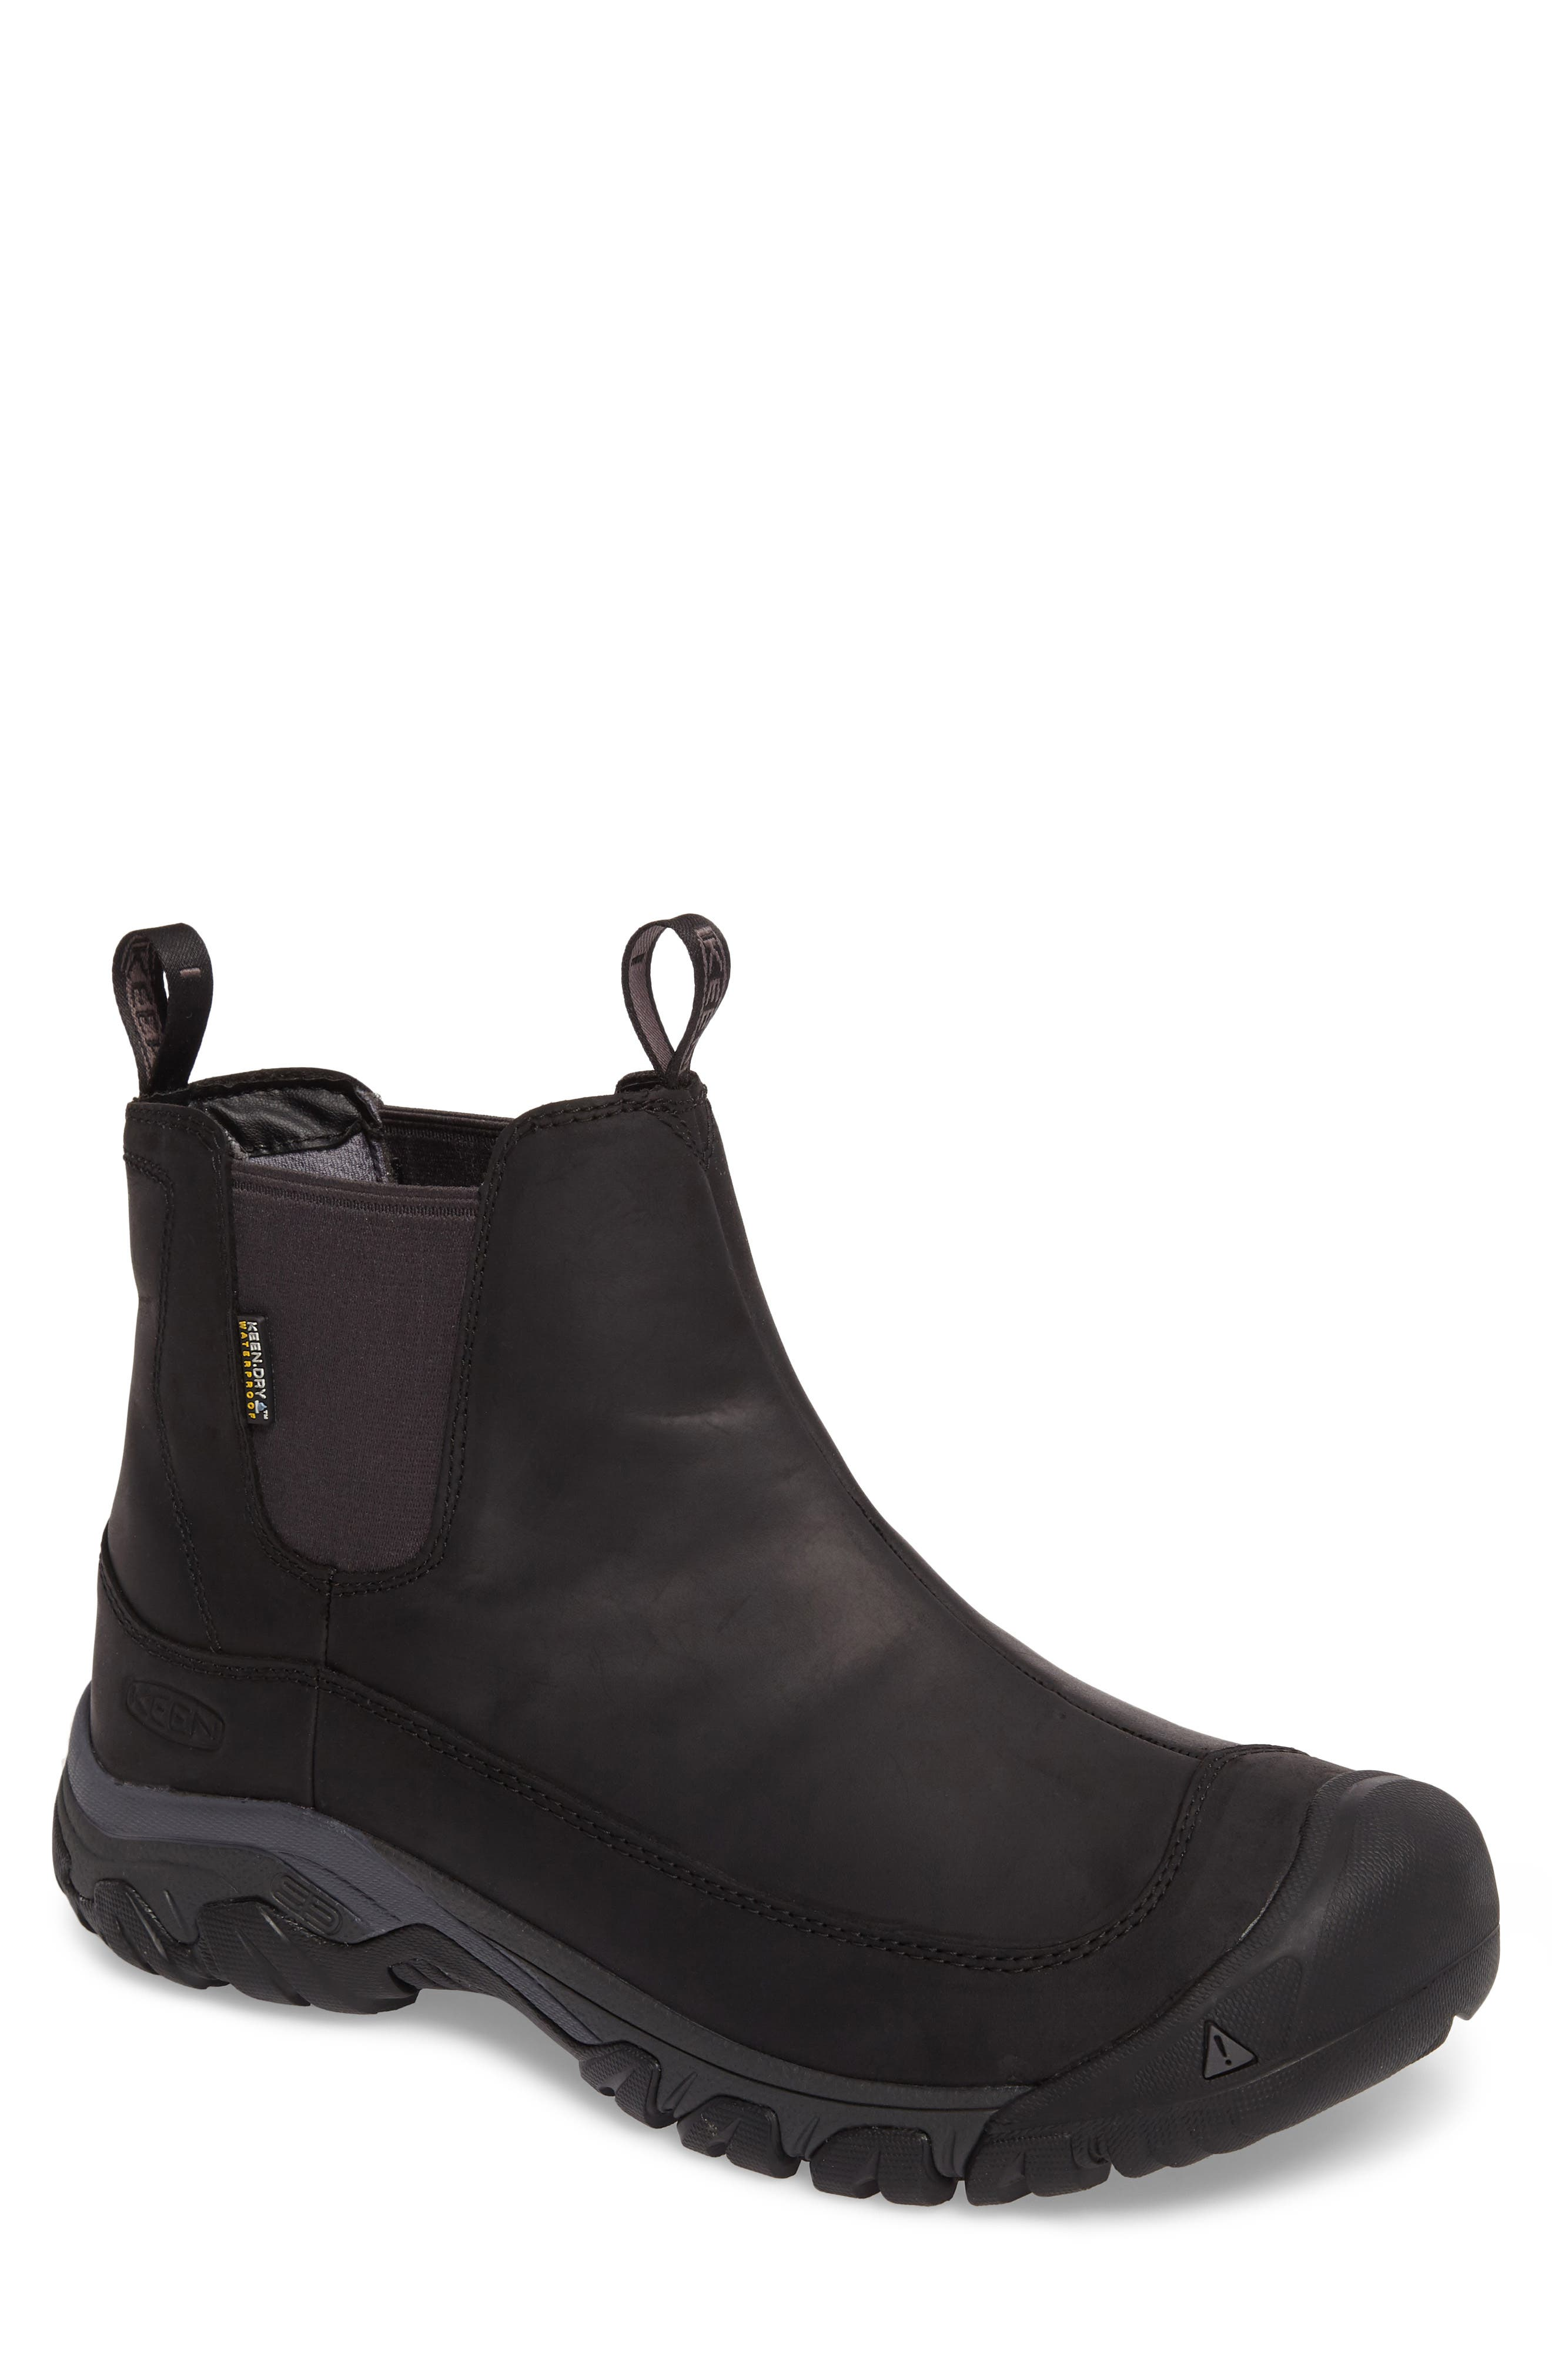 KEEN Anchorage II Waterproof Chelsea Boot, Main, color, 001